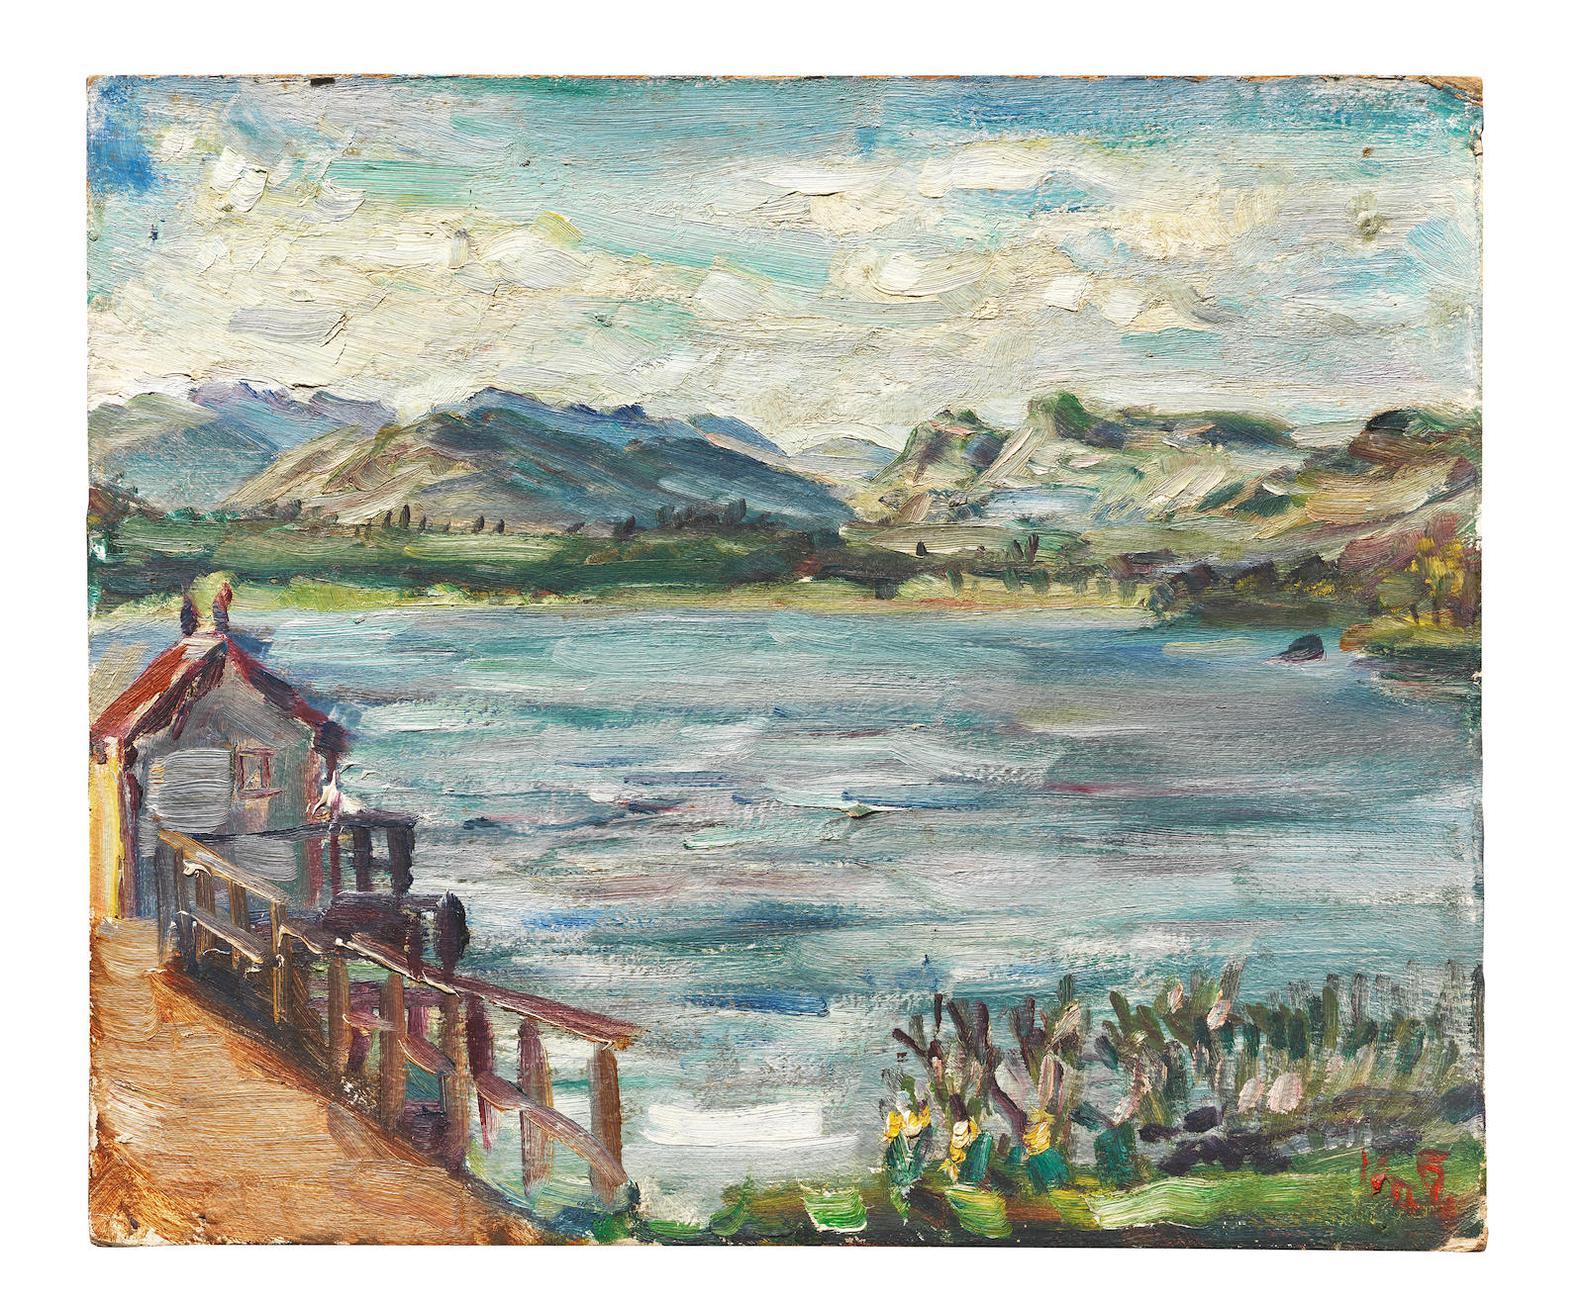 Kurt Schwitters-Untitled (Lake Windermere)-1946